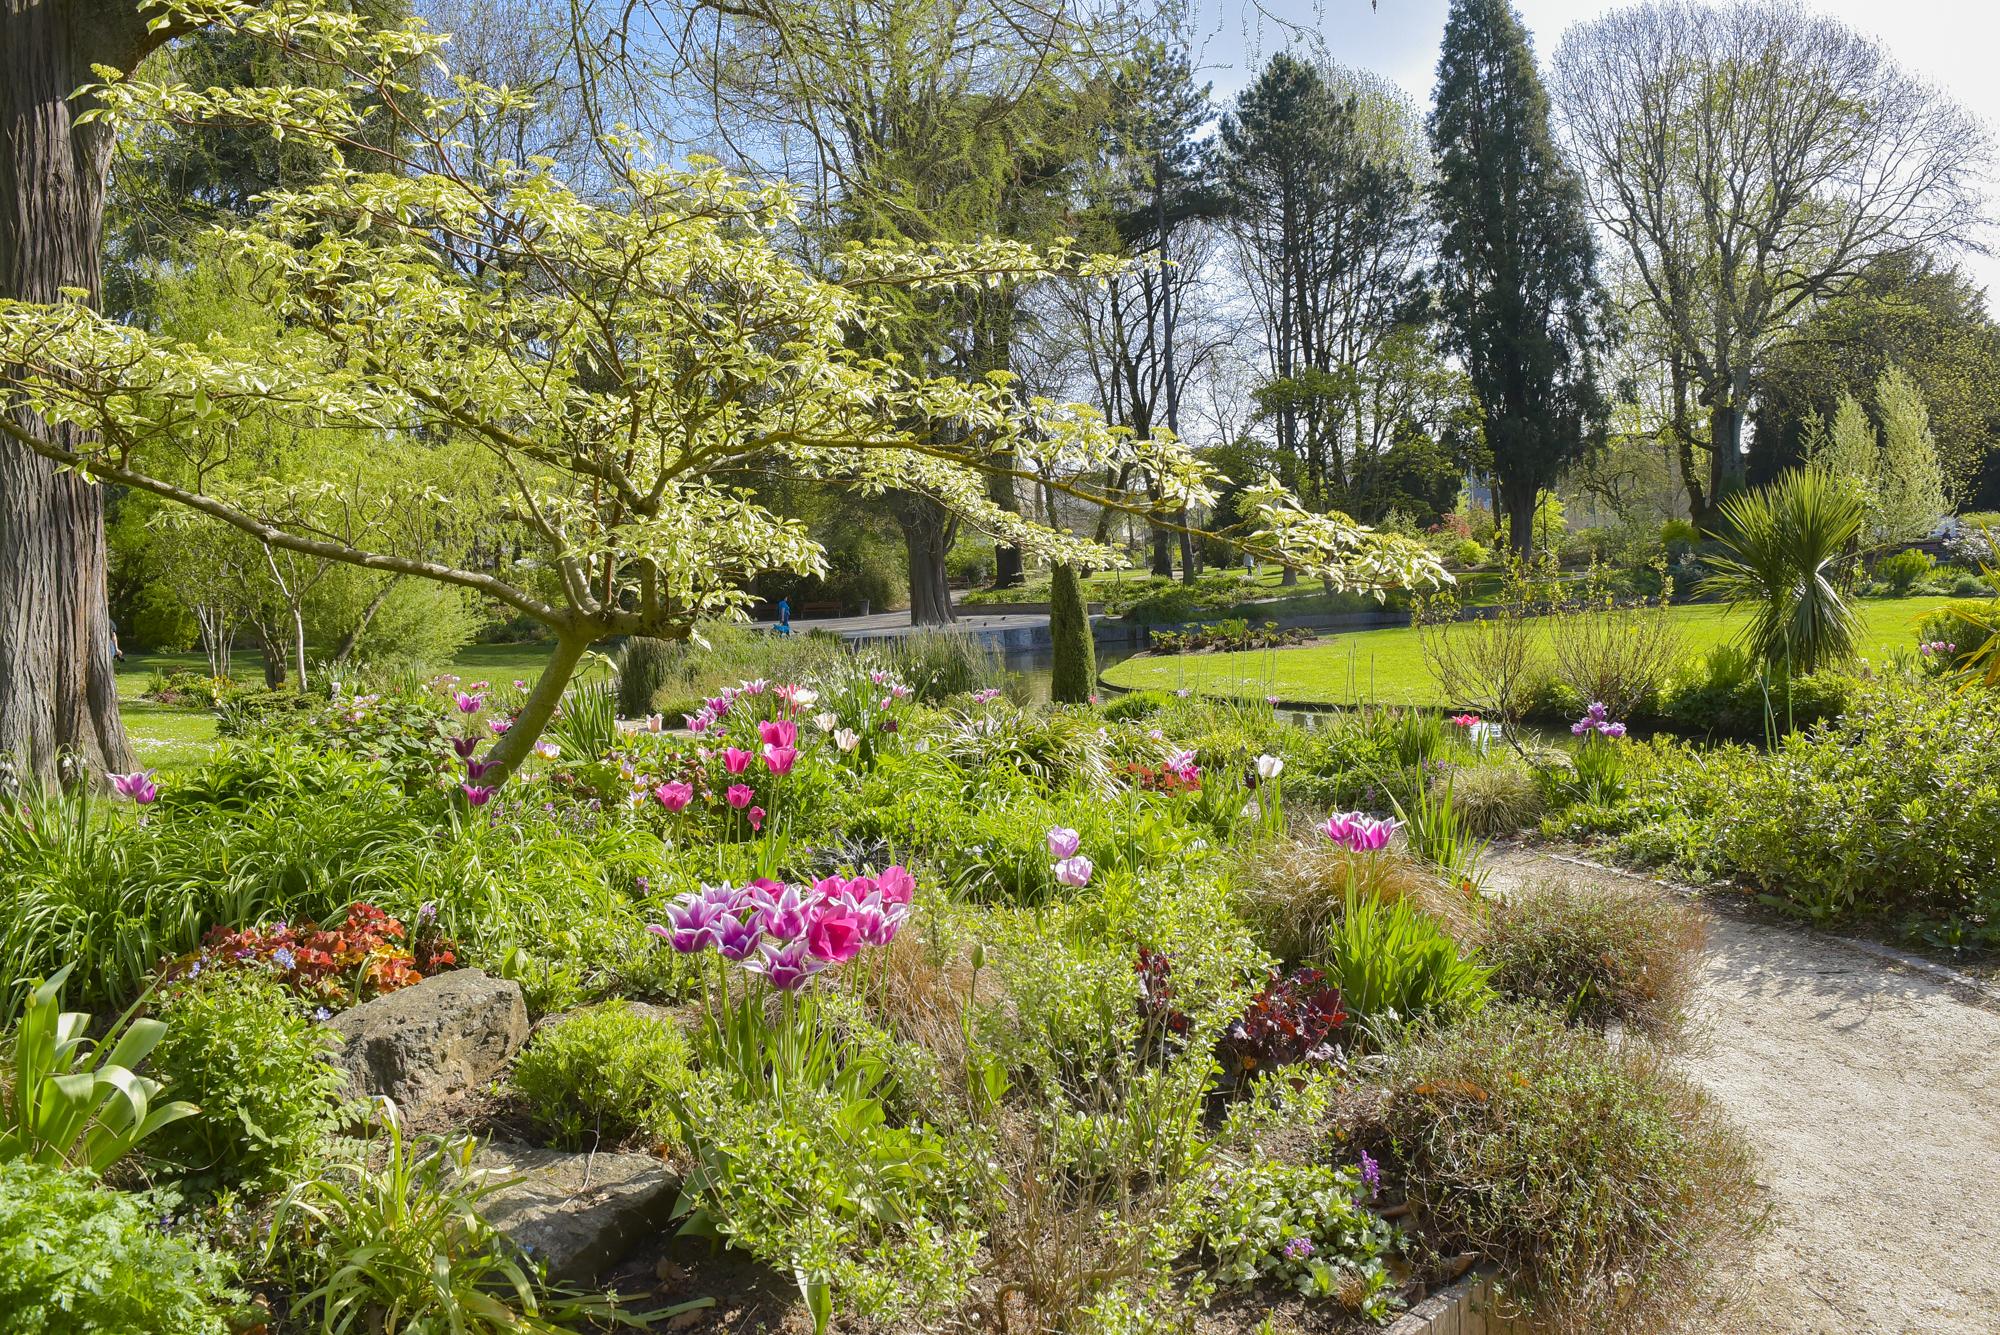 Parcs Et Jardins | Ville De Limoges encequiconcerne Conception Jardin Limoges